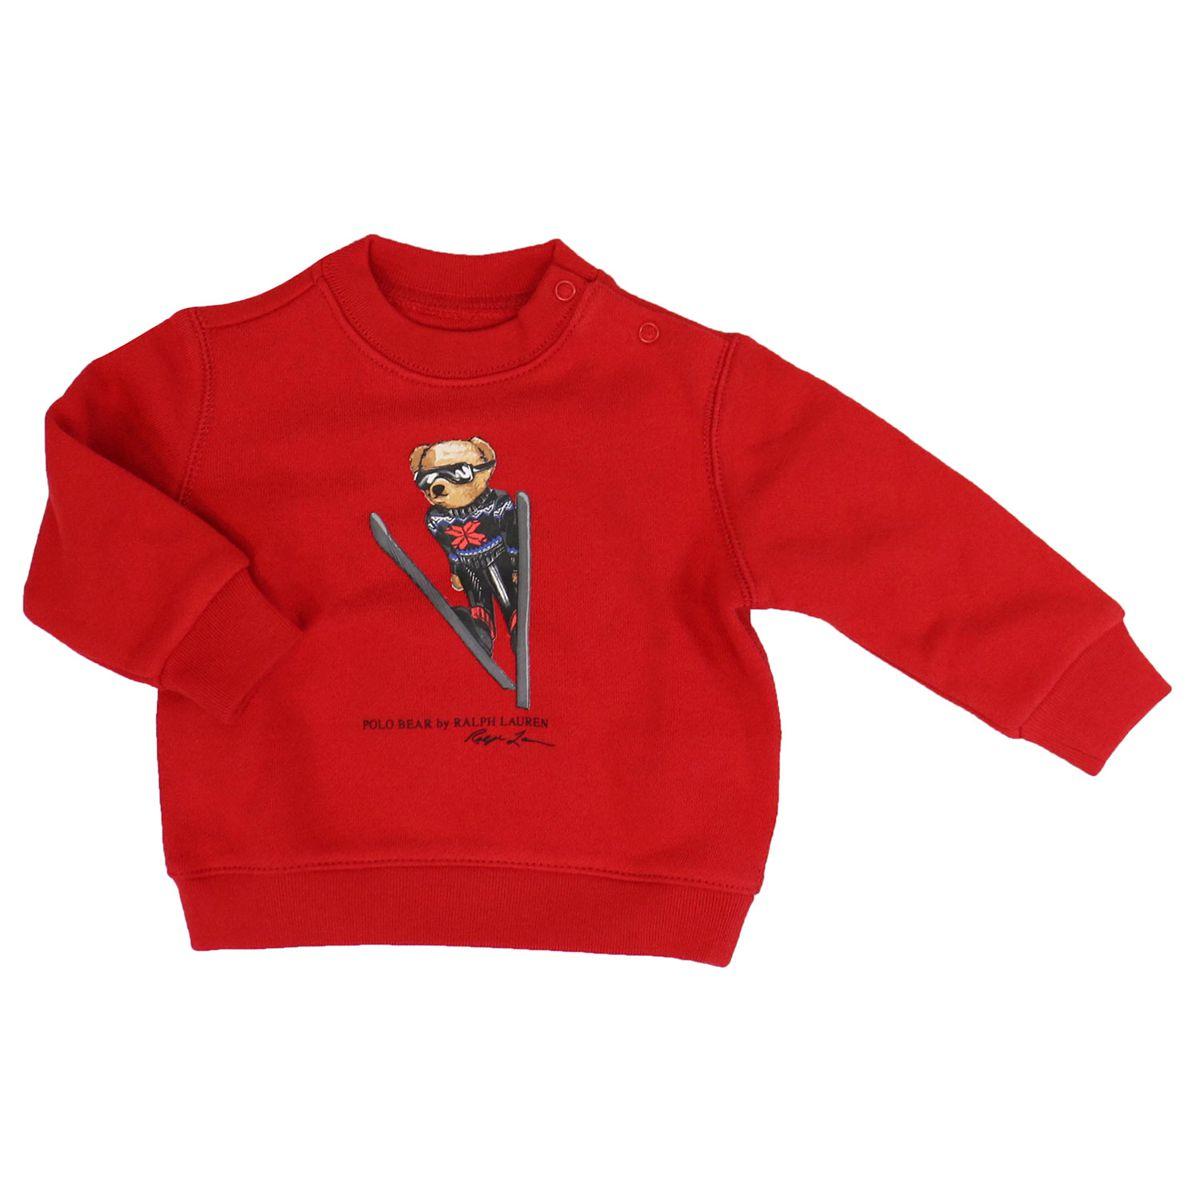 Cotton crewneck sweatshirt with logo print Red Polo Ralph Lauren